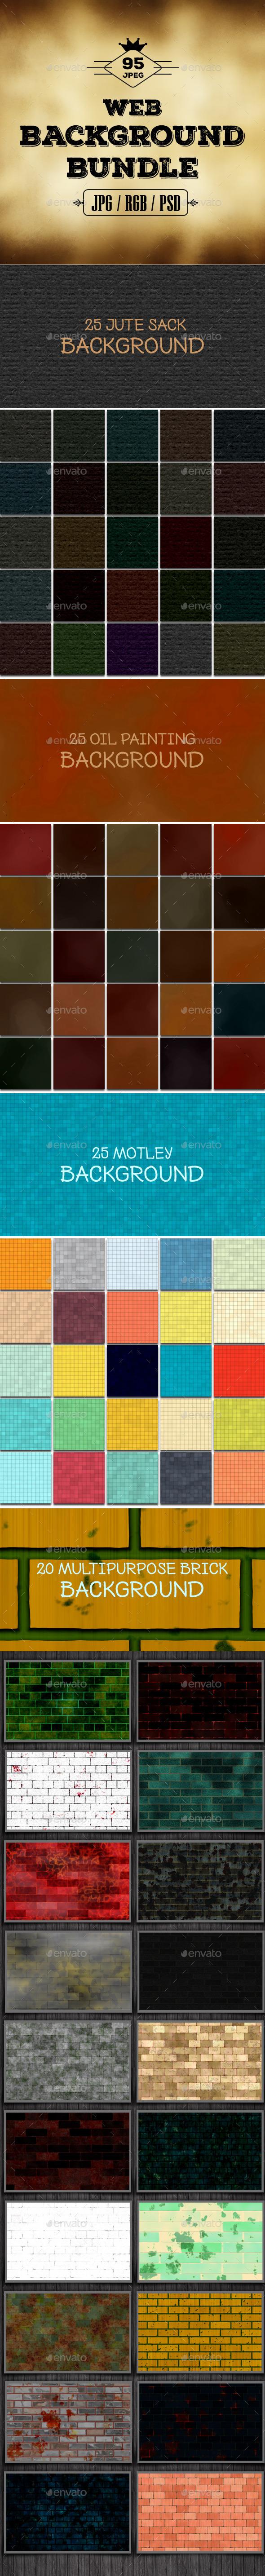 95 Web Background Bundle - Miscellaneous Backgrounds